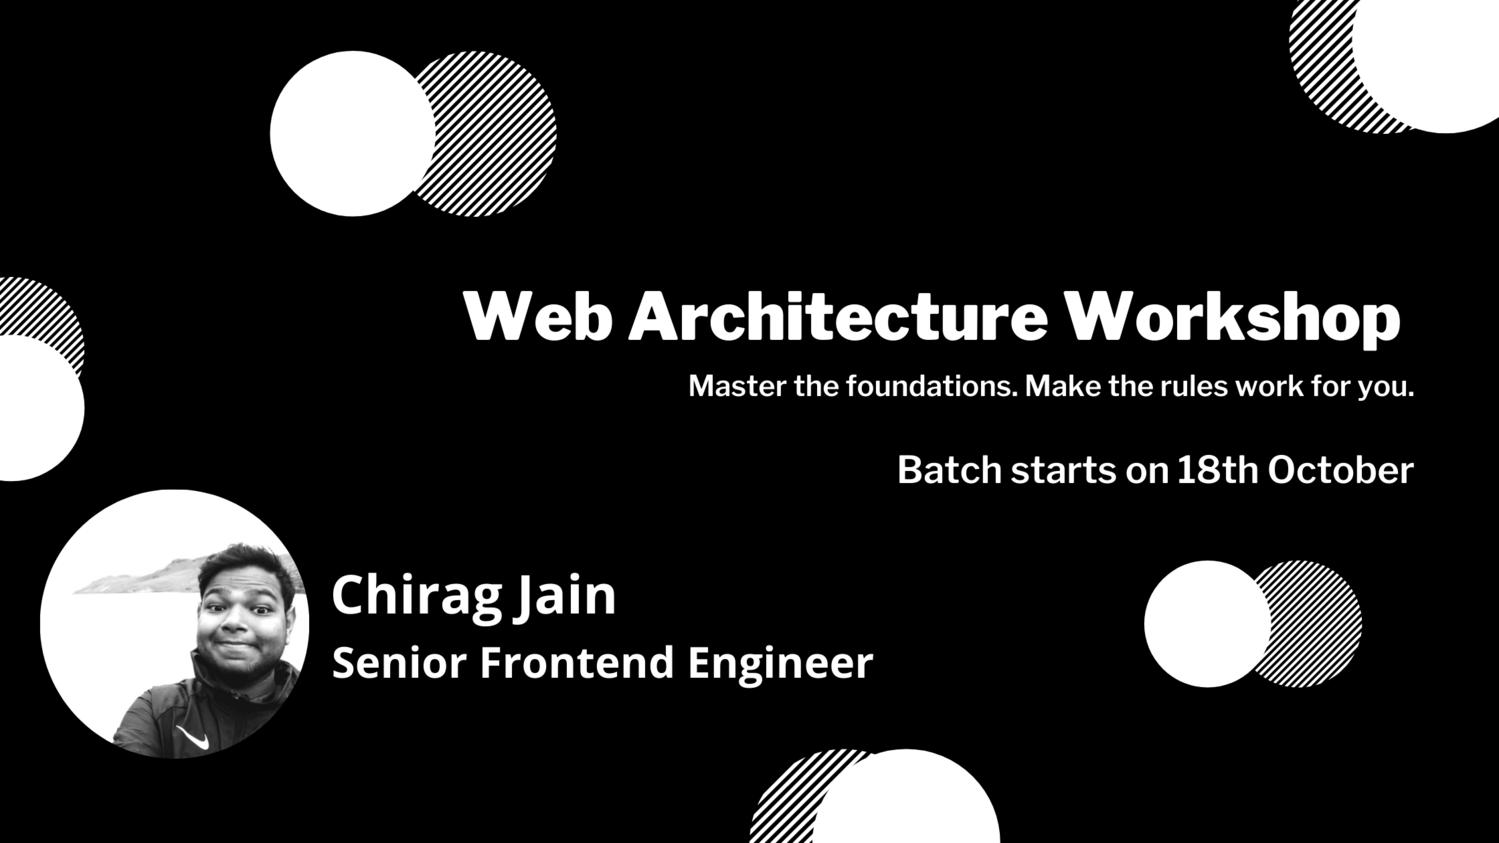 Web Architecture Workshop